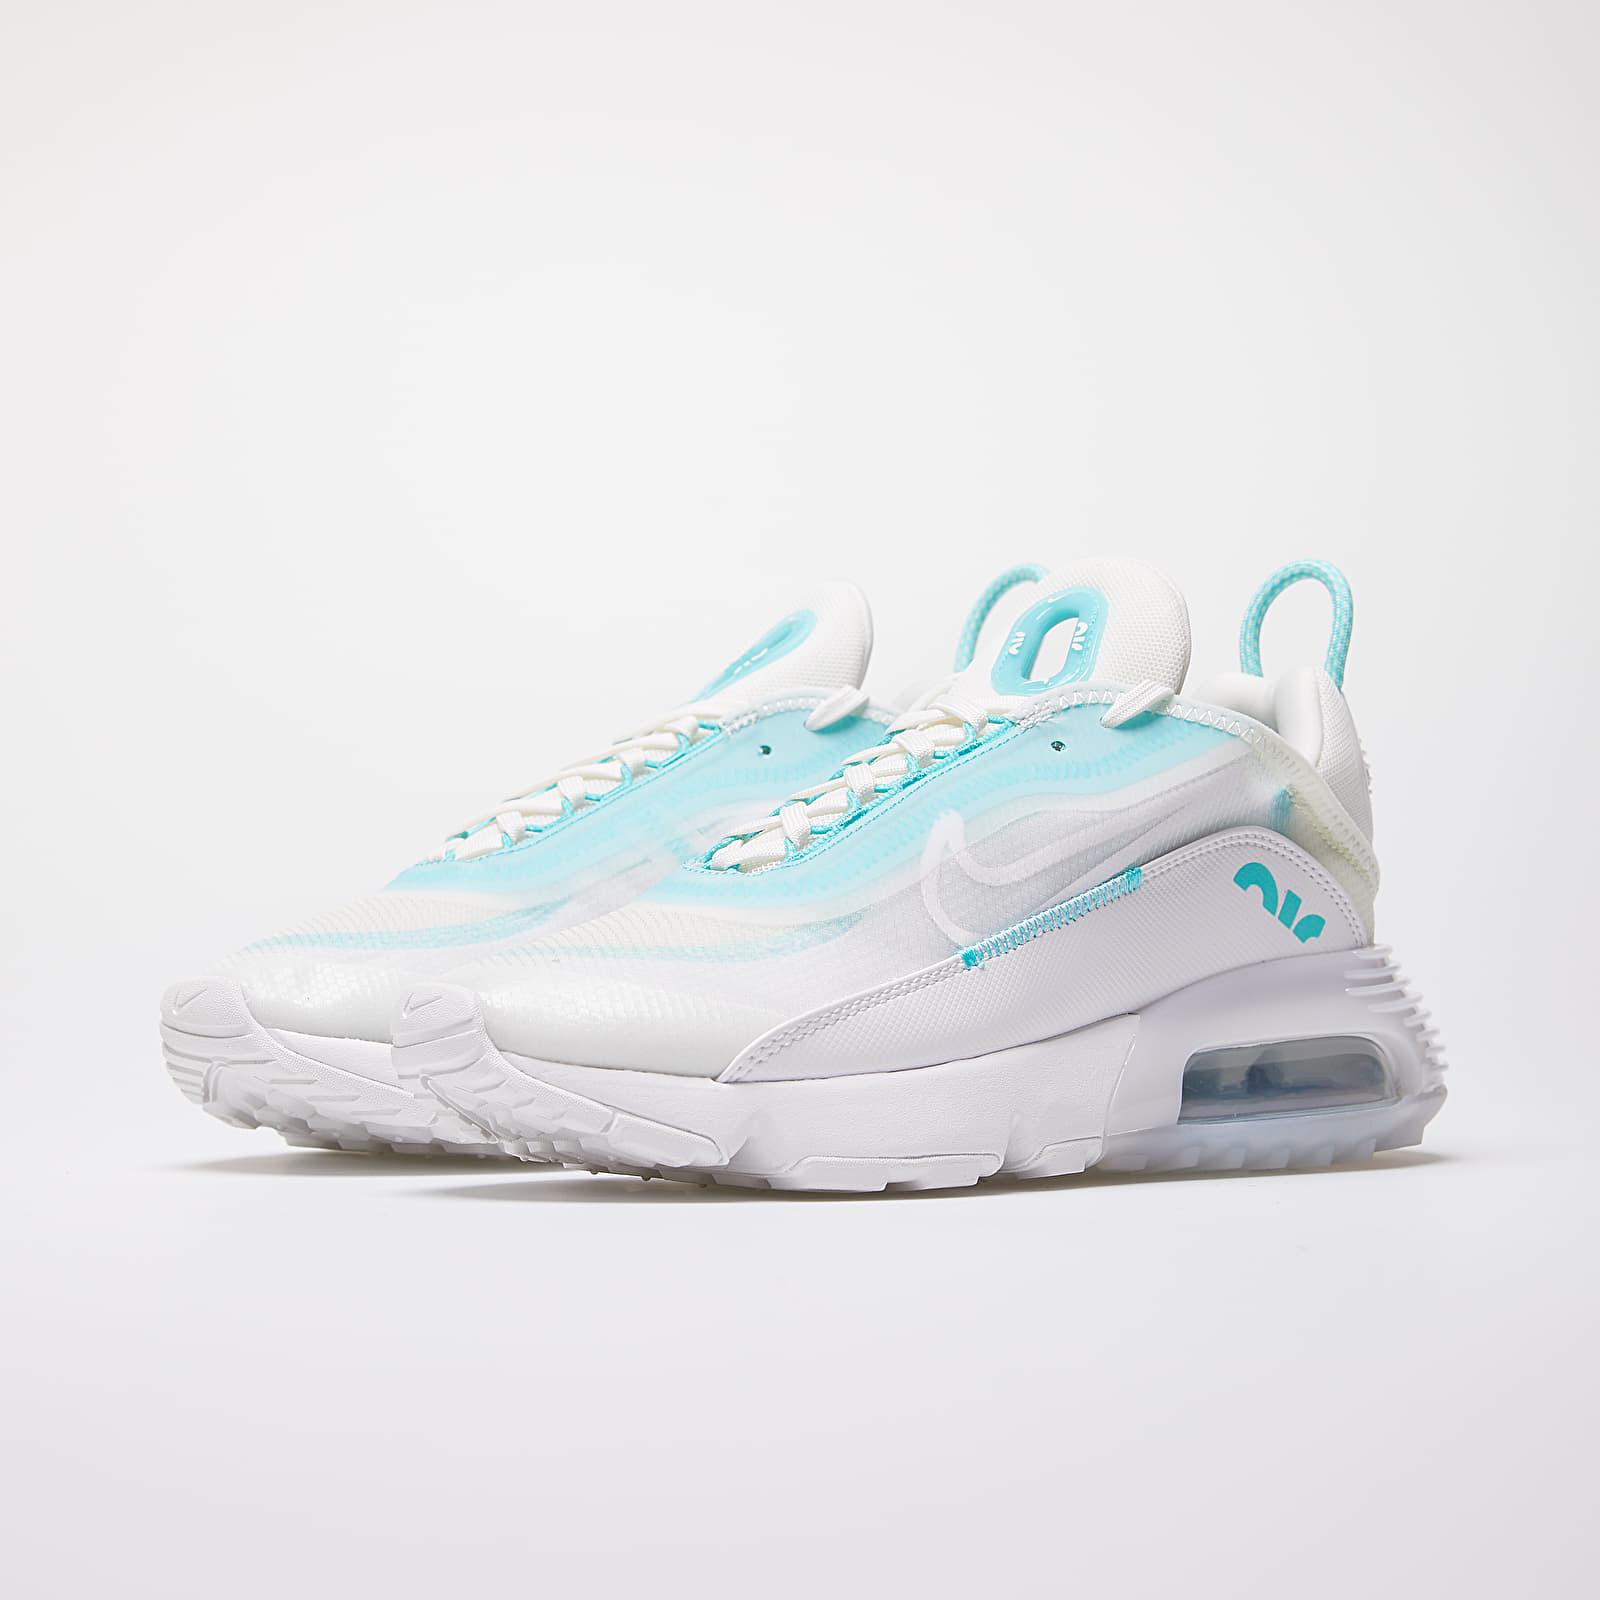 Adidasi Nike de dama